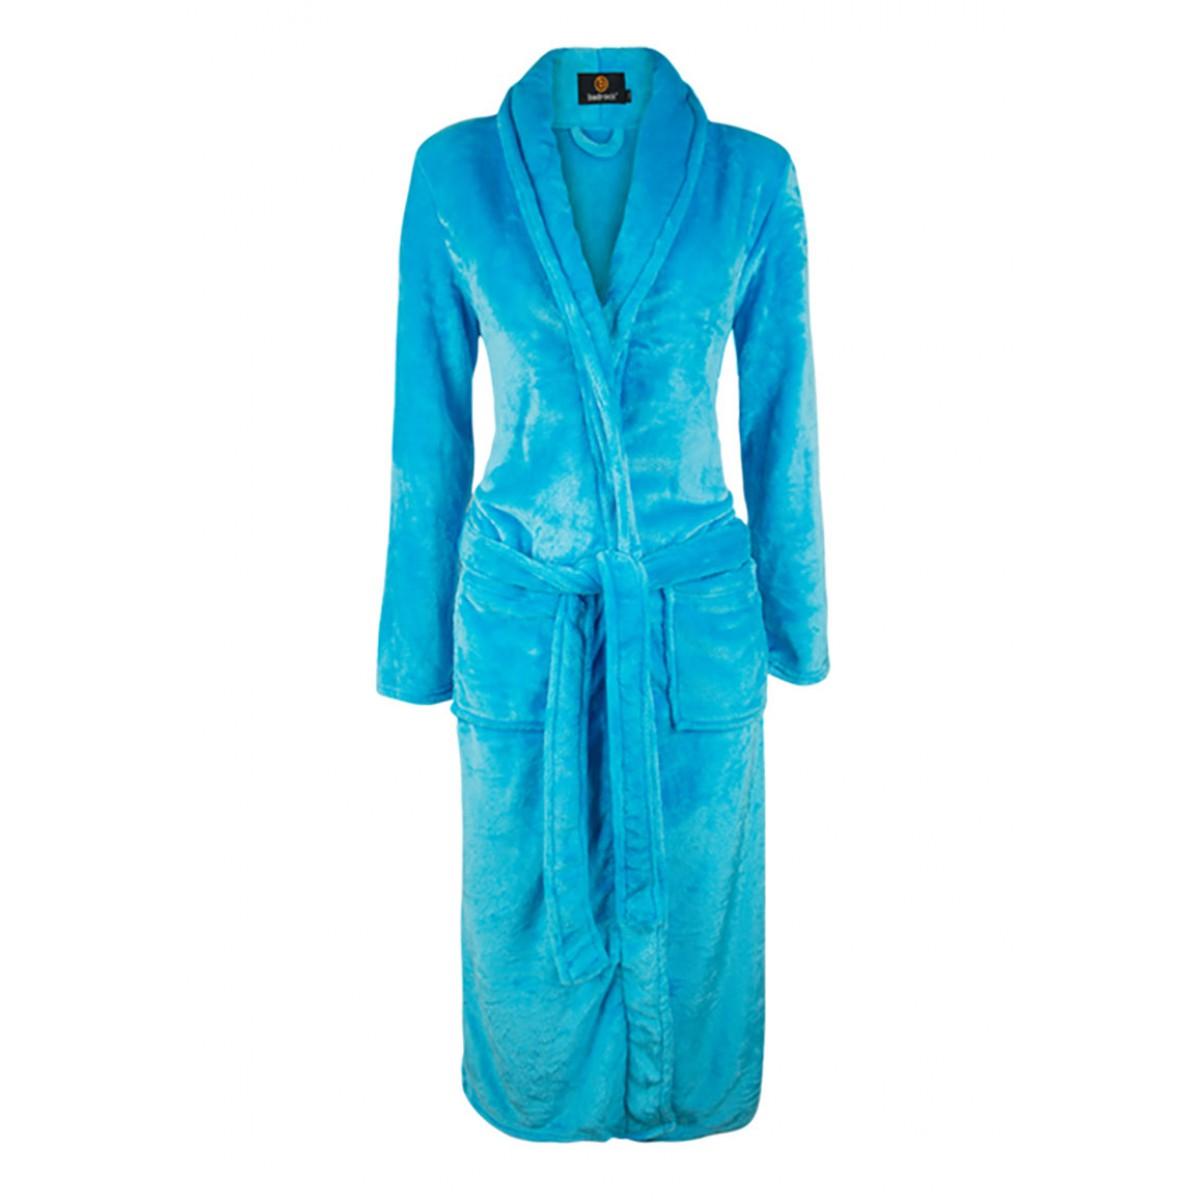 Aquablauwe badjas